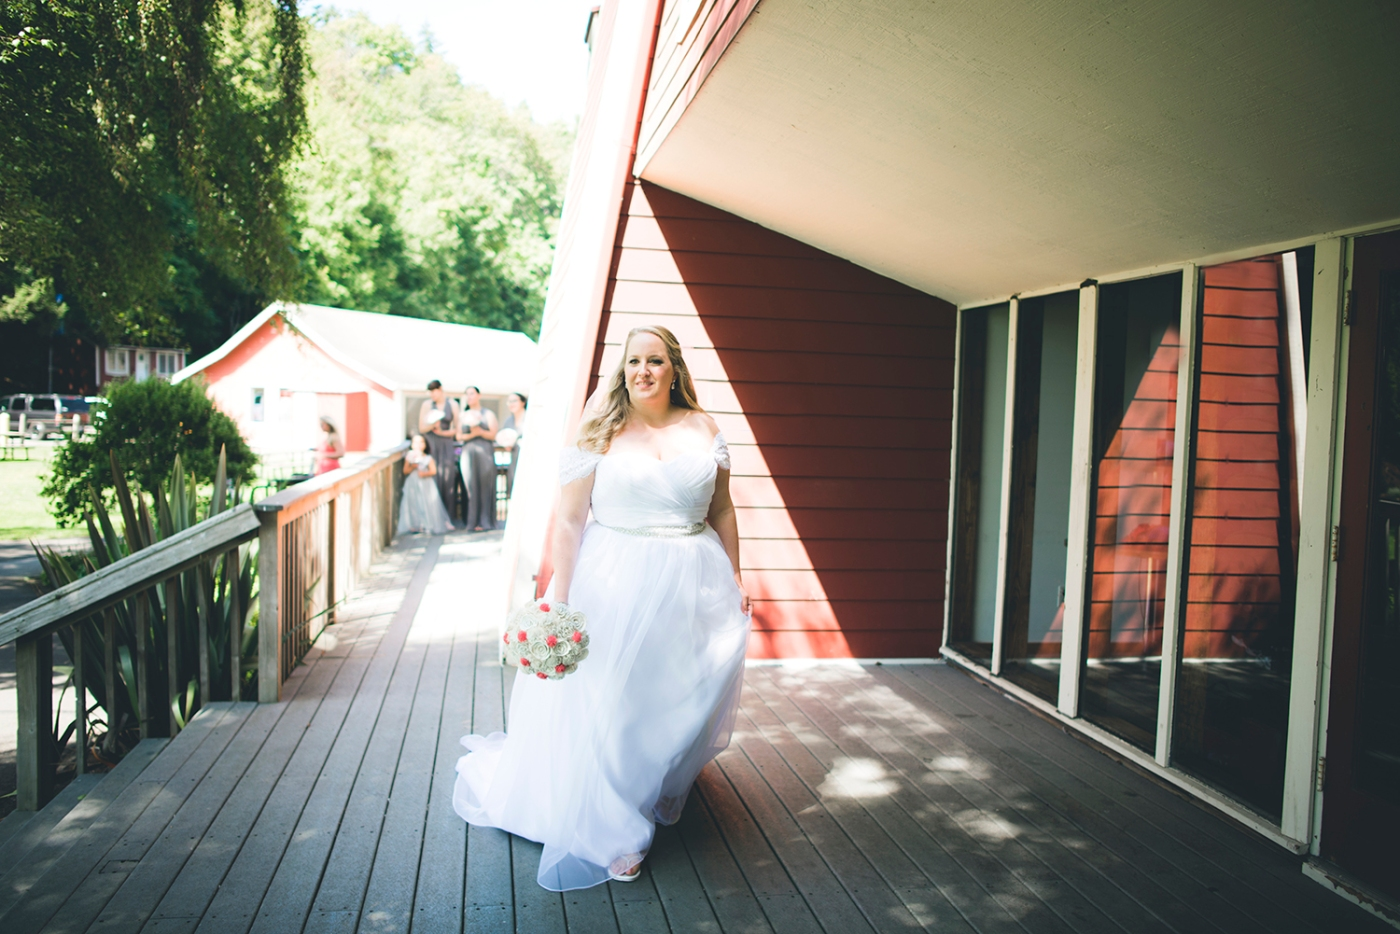 Jane_S_photography_Kadie_and_Steve_2016_Des_Moines_Marina_WeddingDSC_1507